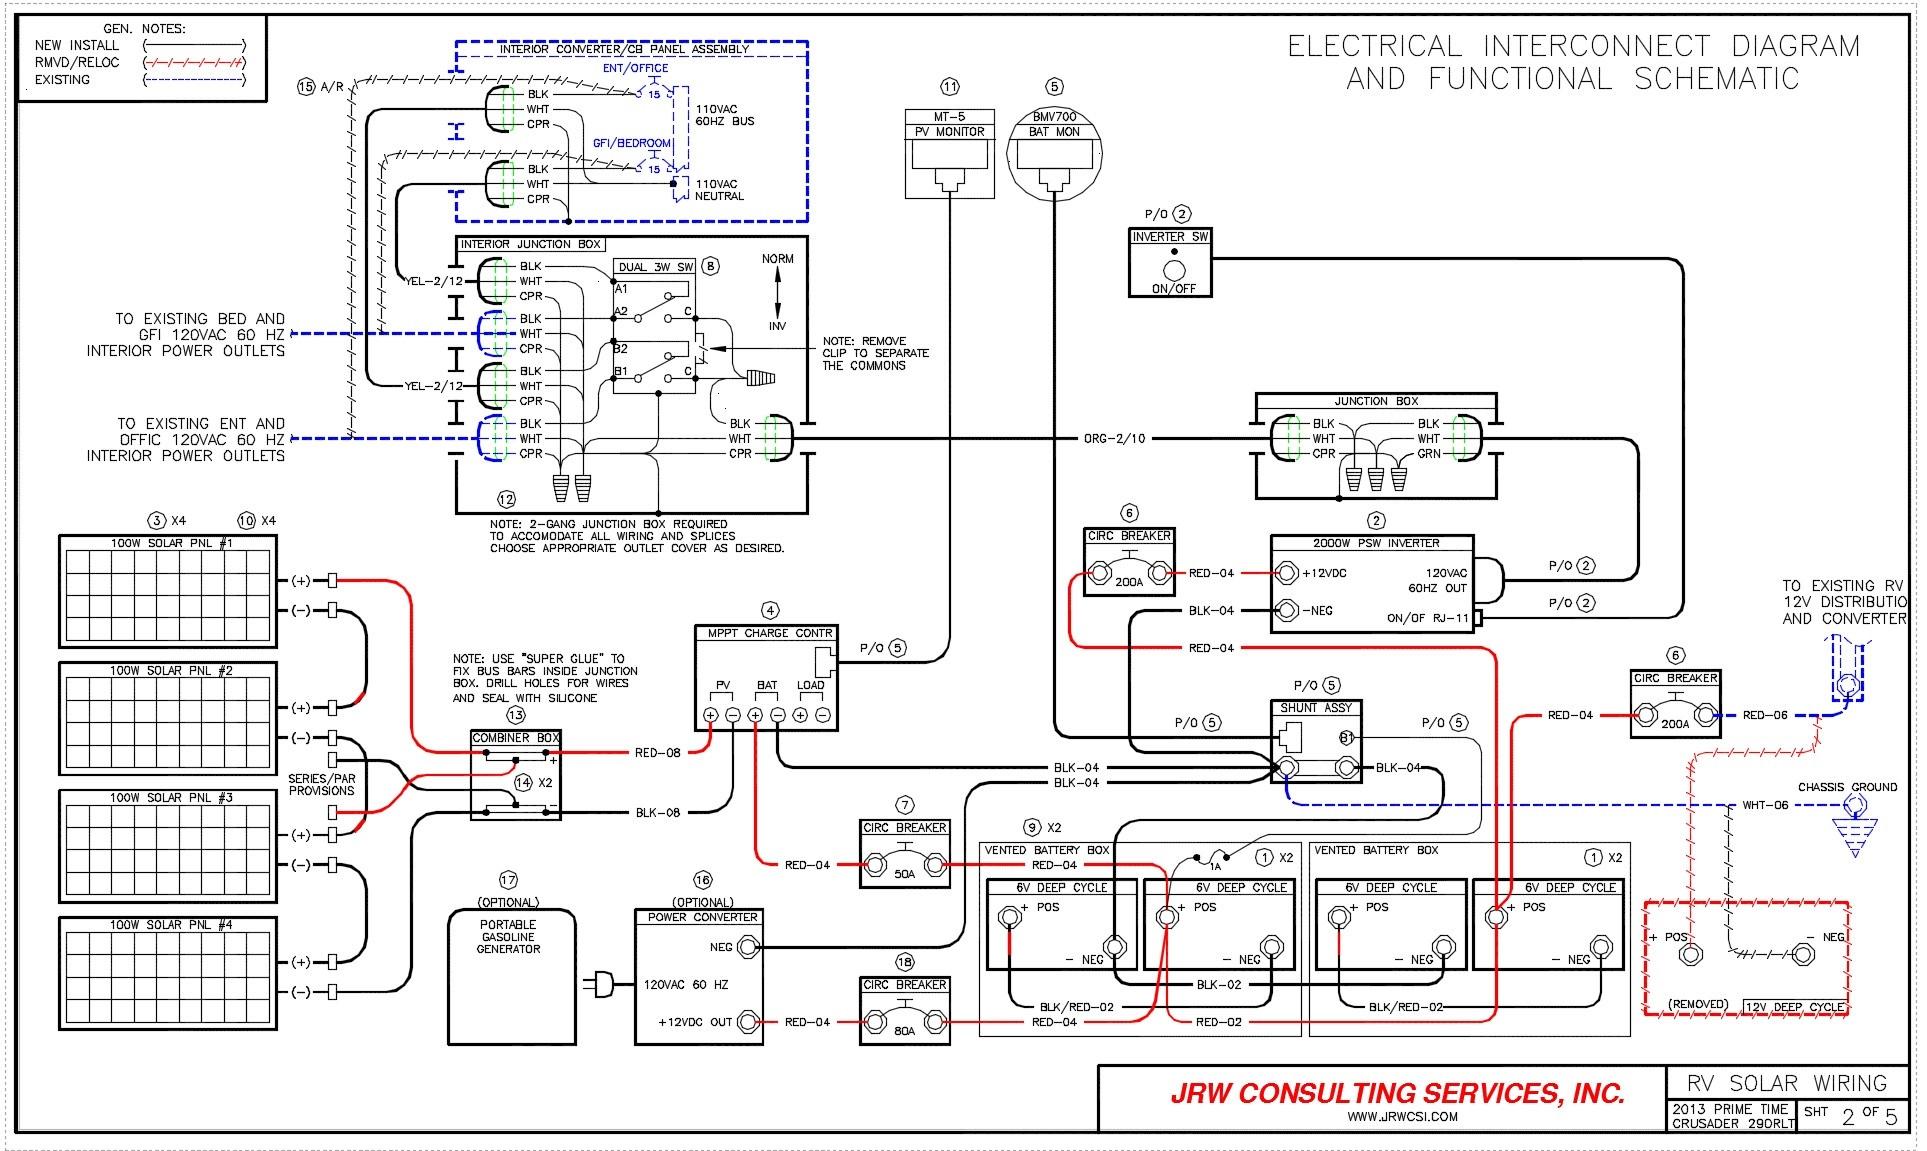 rv power wire diagram wiring diagram data rv park wiring diagram free picture